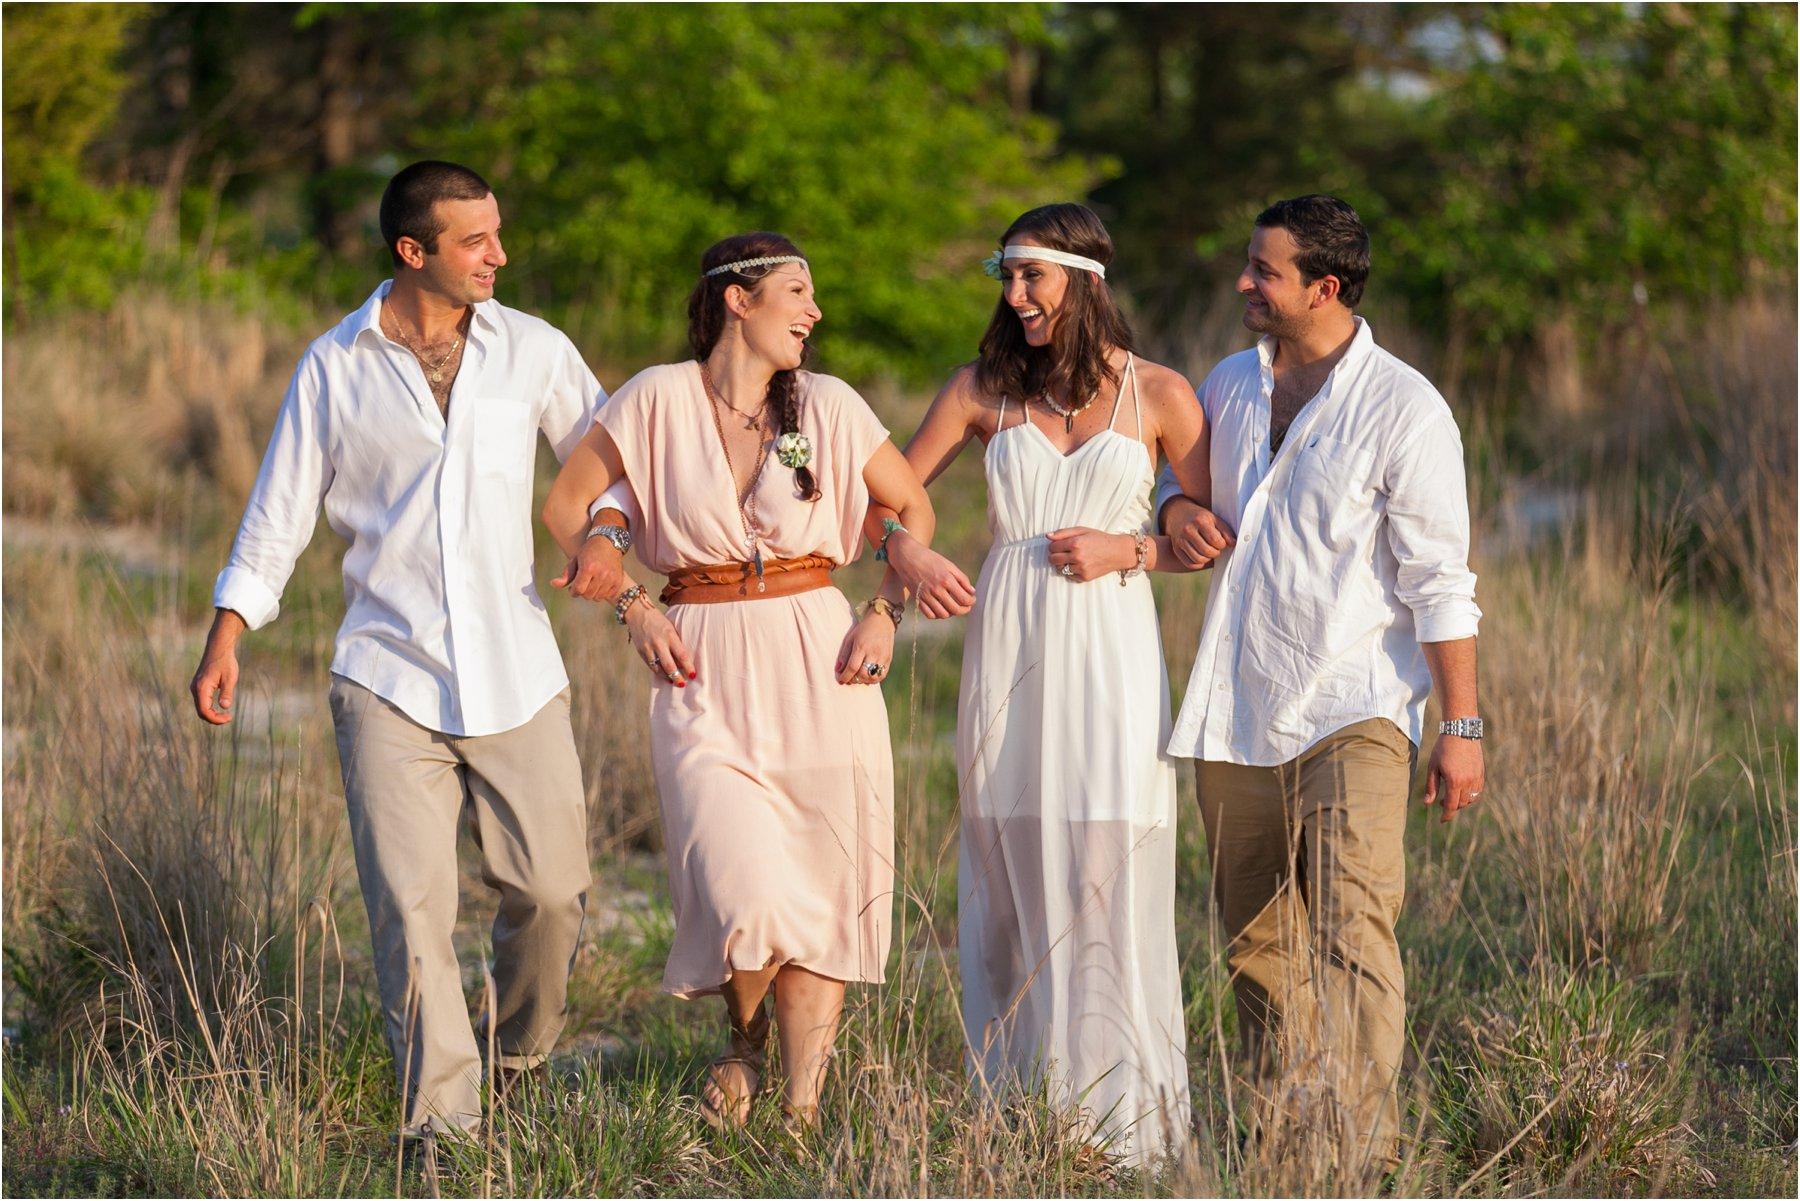 first_landing_wedding_boho_wedding_photography_virginia_Jessica_ryan_photography_0207